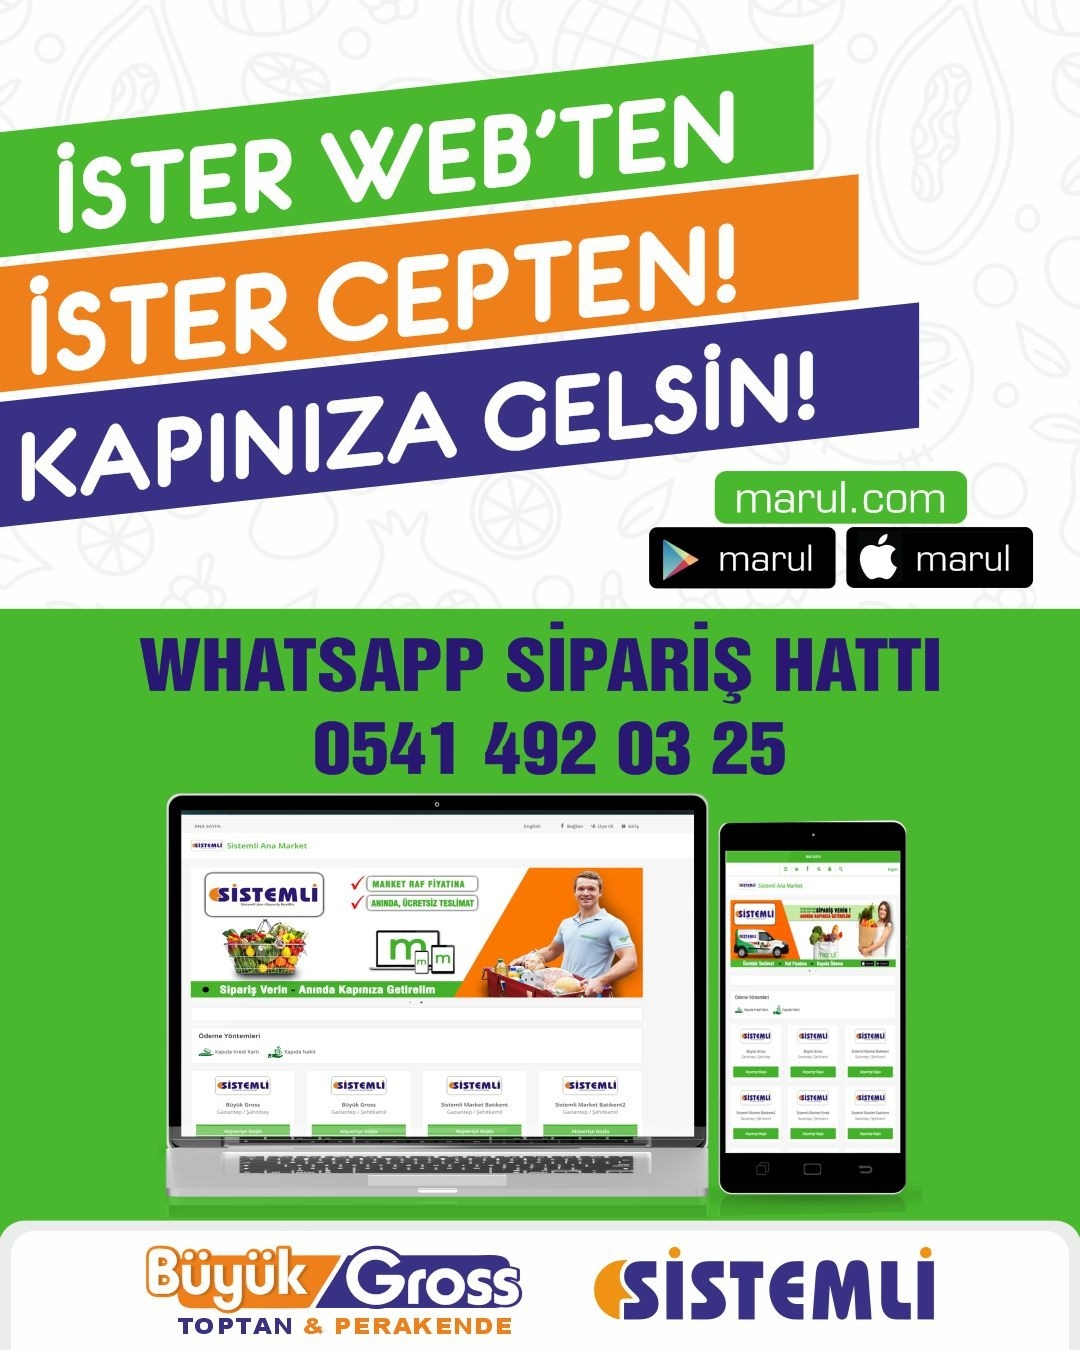 Gaziantep sistemli market online sipariş whatsap telefonla sipairş